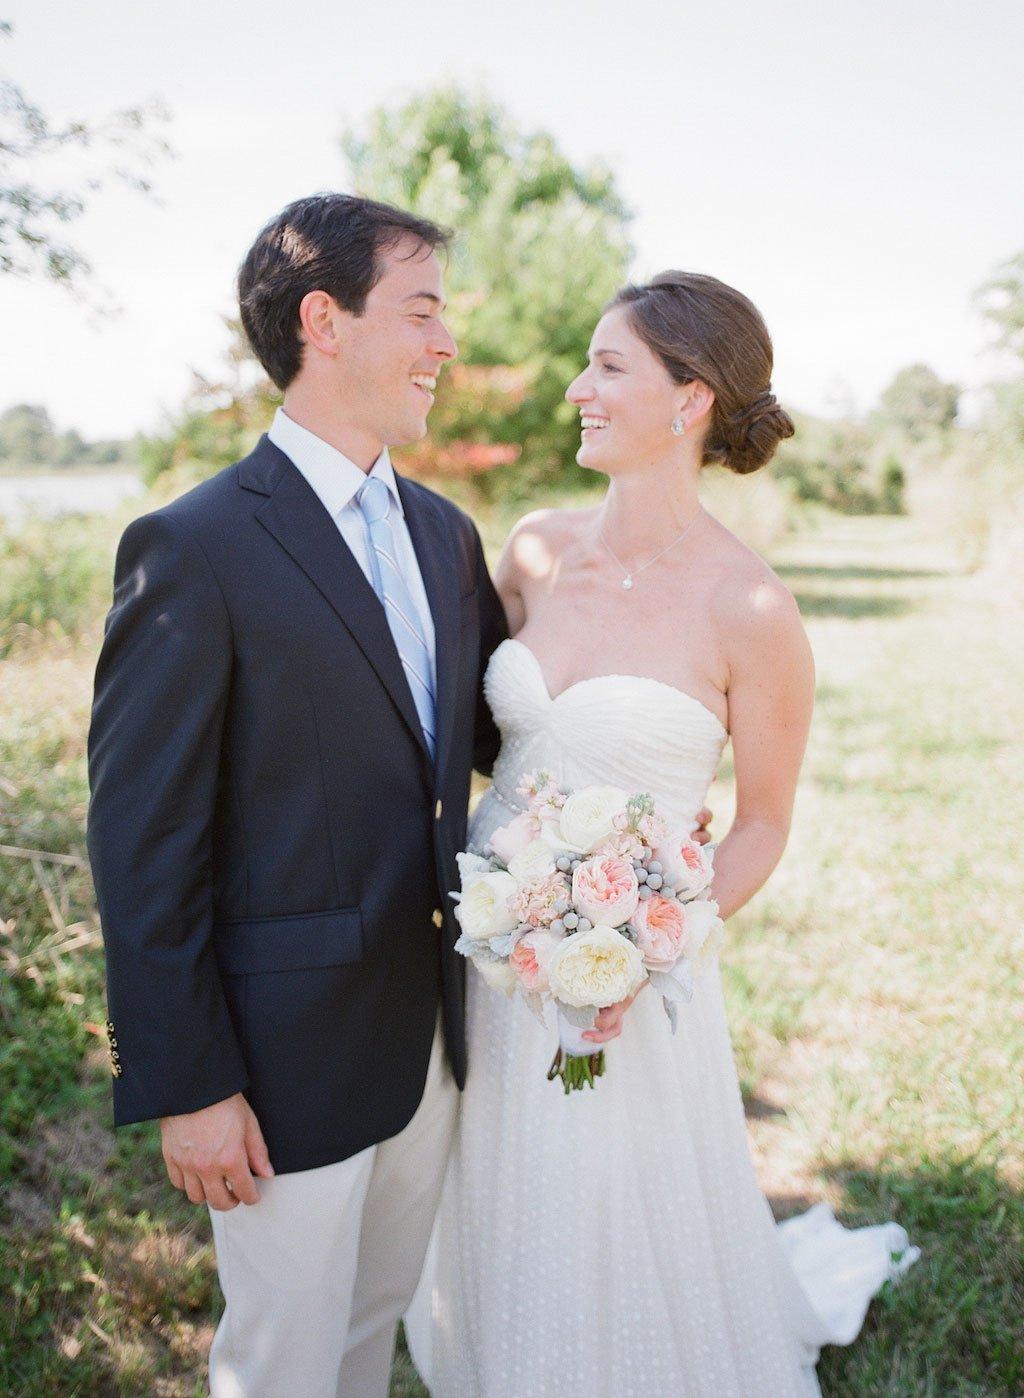 4-20-16-preppy-eastern-shore-tent-wedding-3